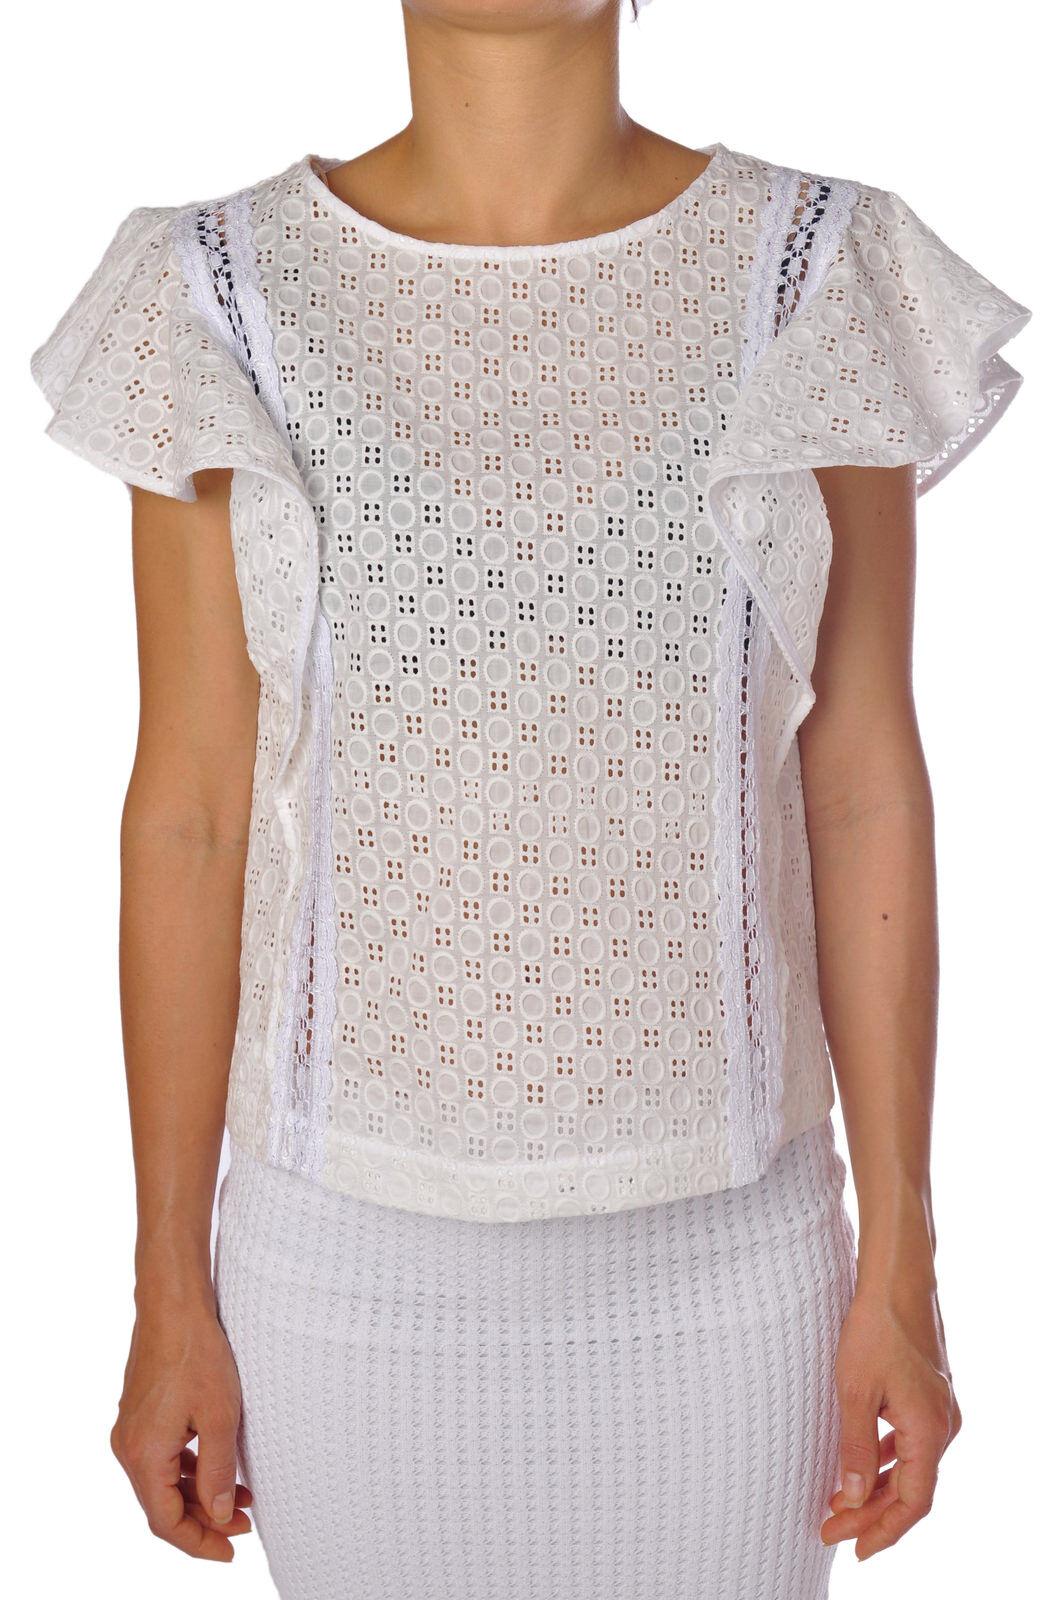 Rosao - Shirts-Blouses - woman - Blau - 803018C184740